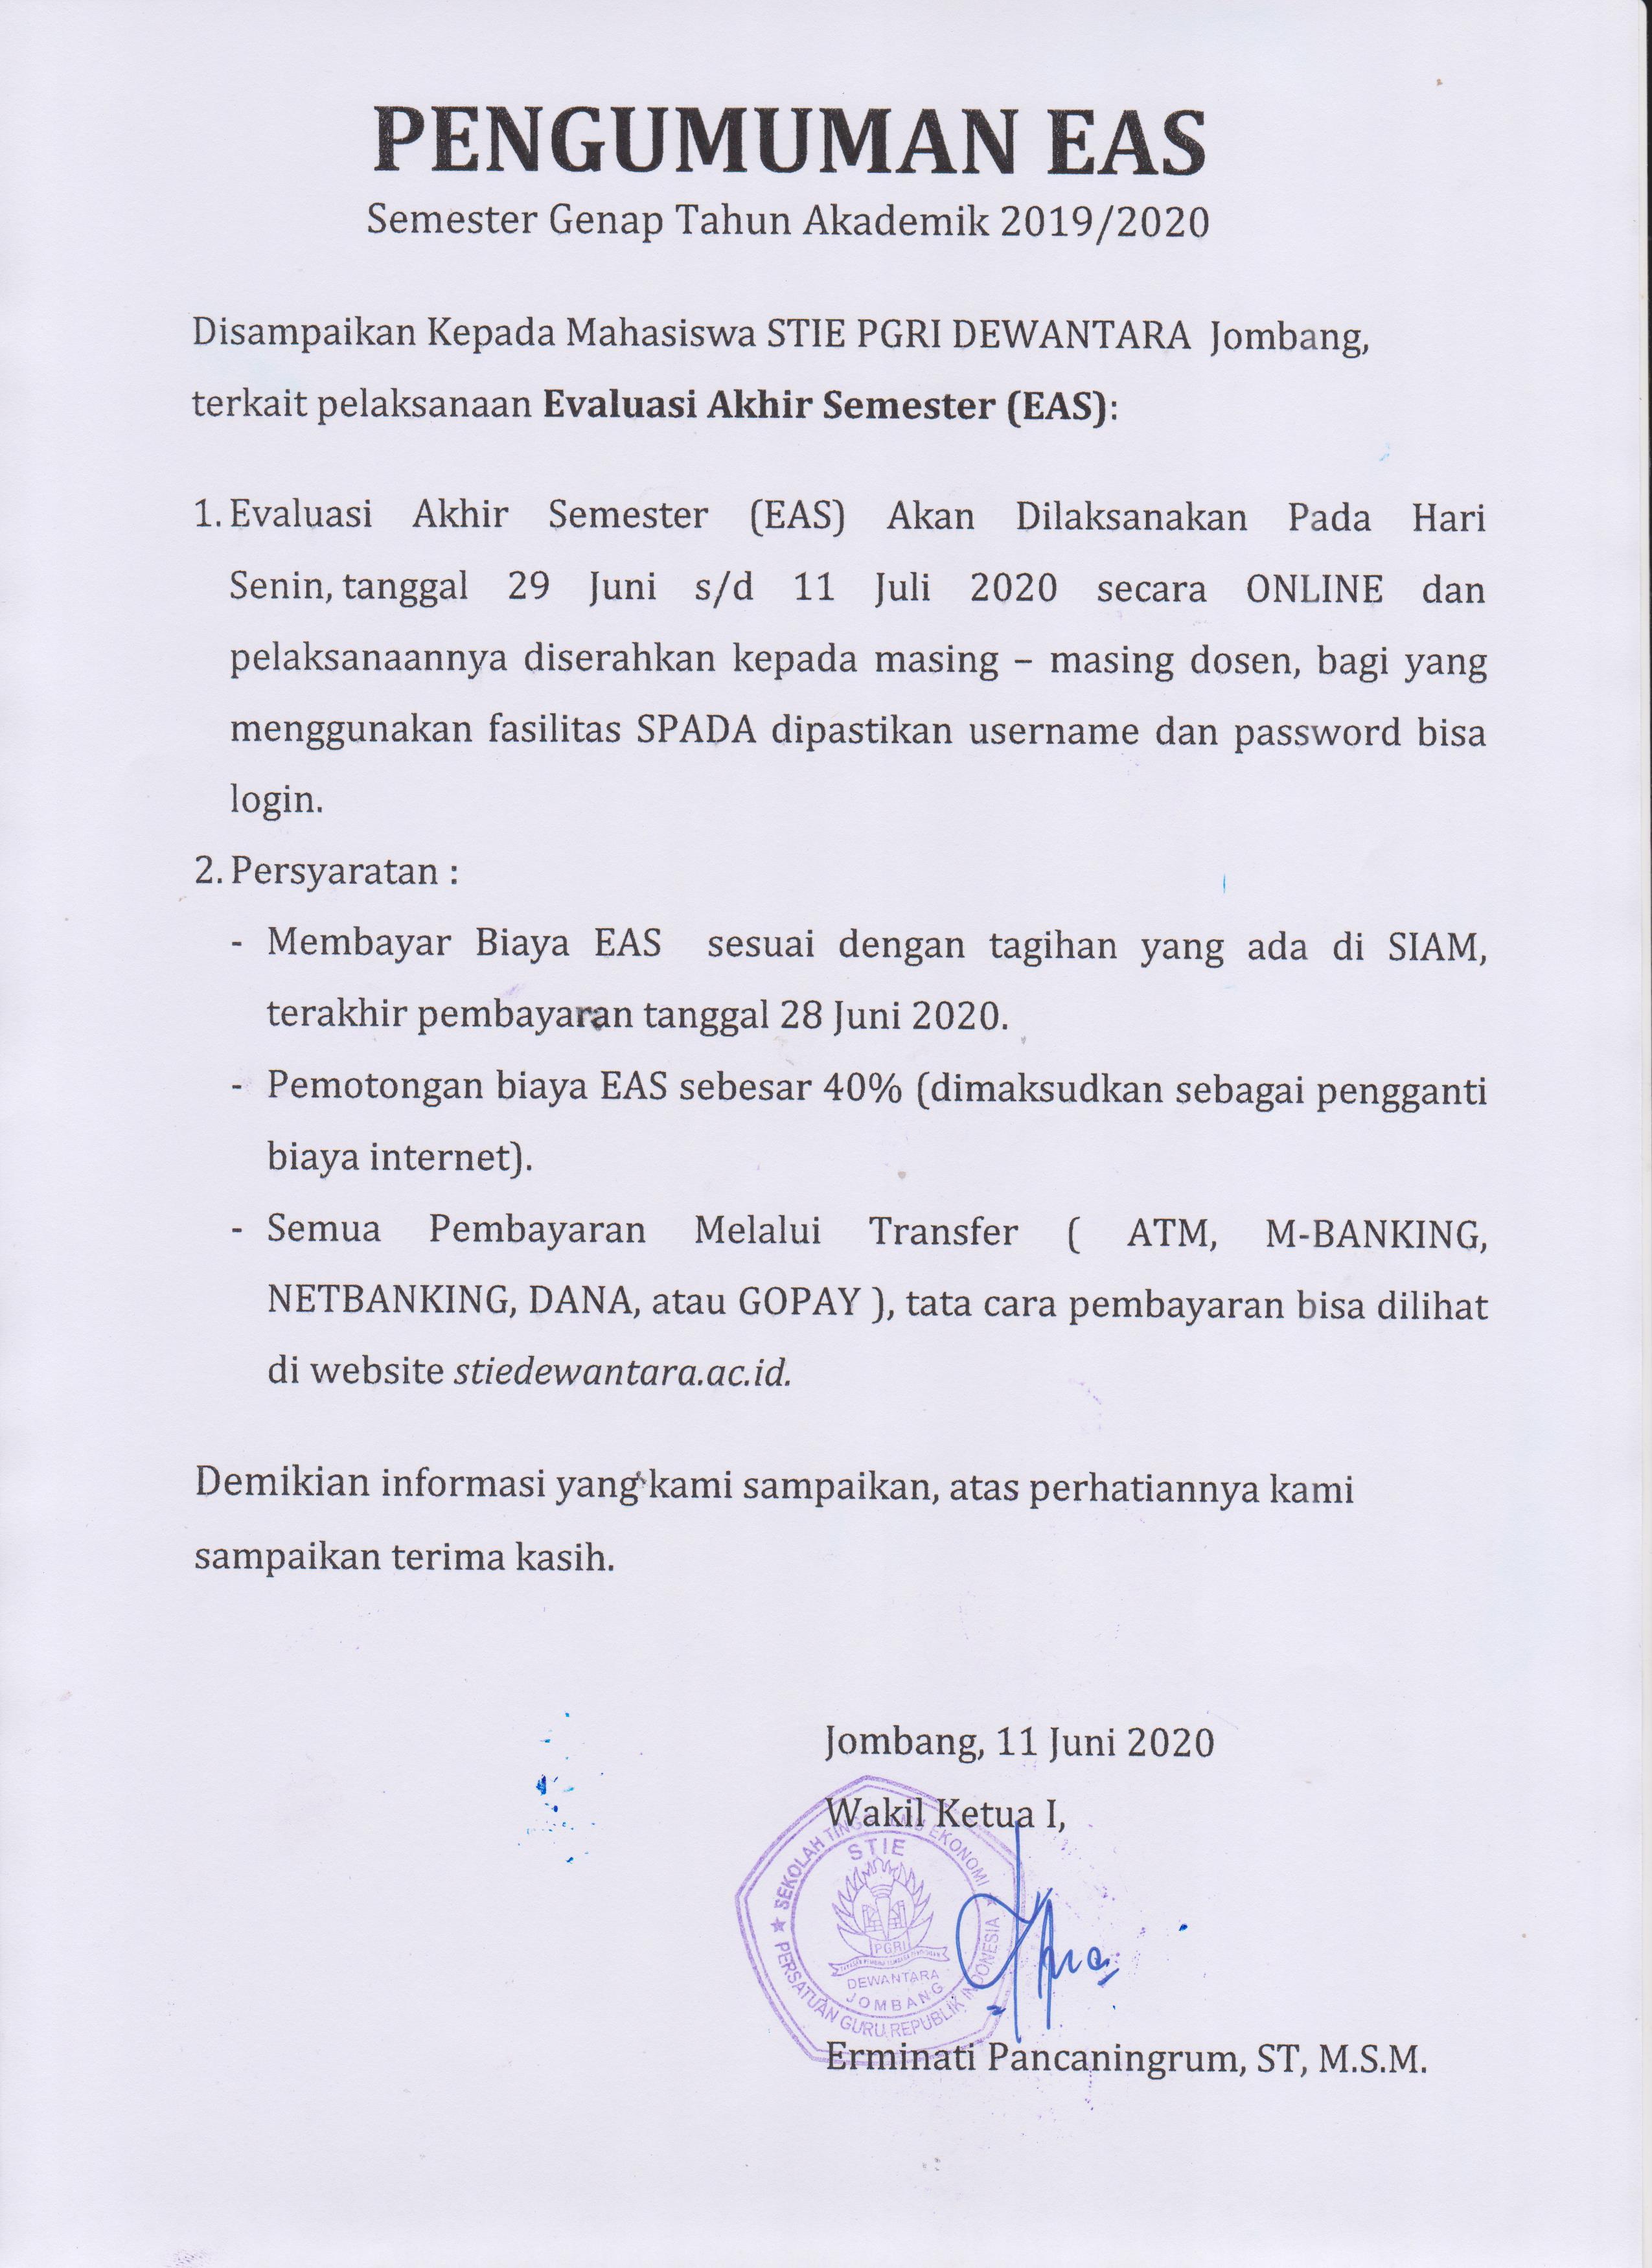 PENGUMUMAN EAS SEMESTER GENAP TAHUN AKADEMIK 2019/2020